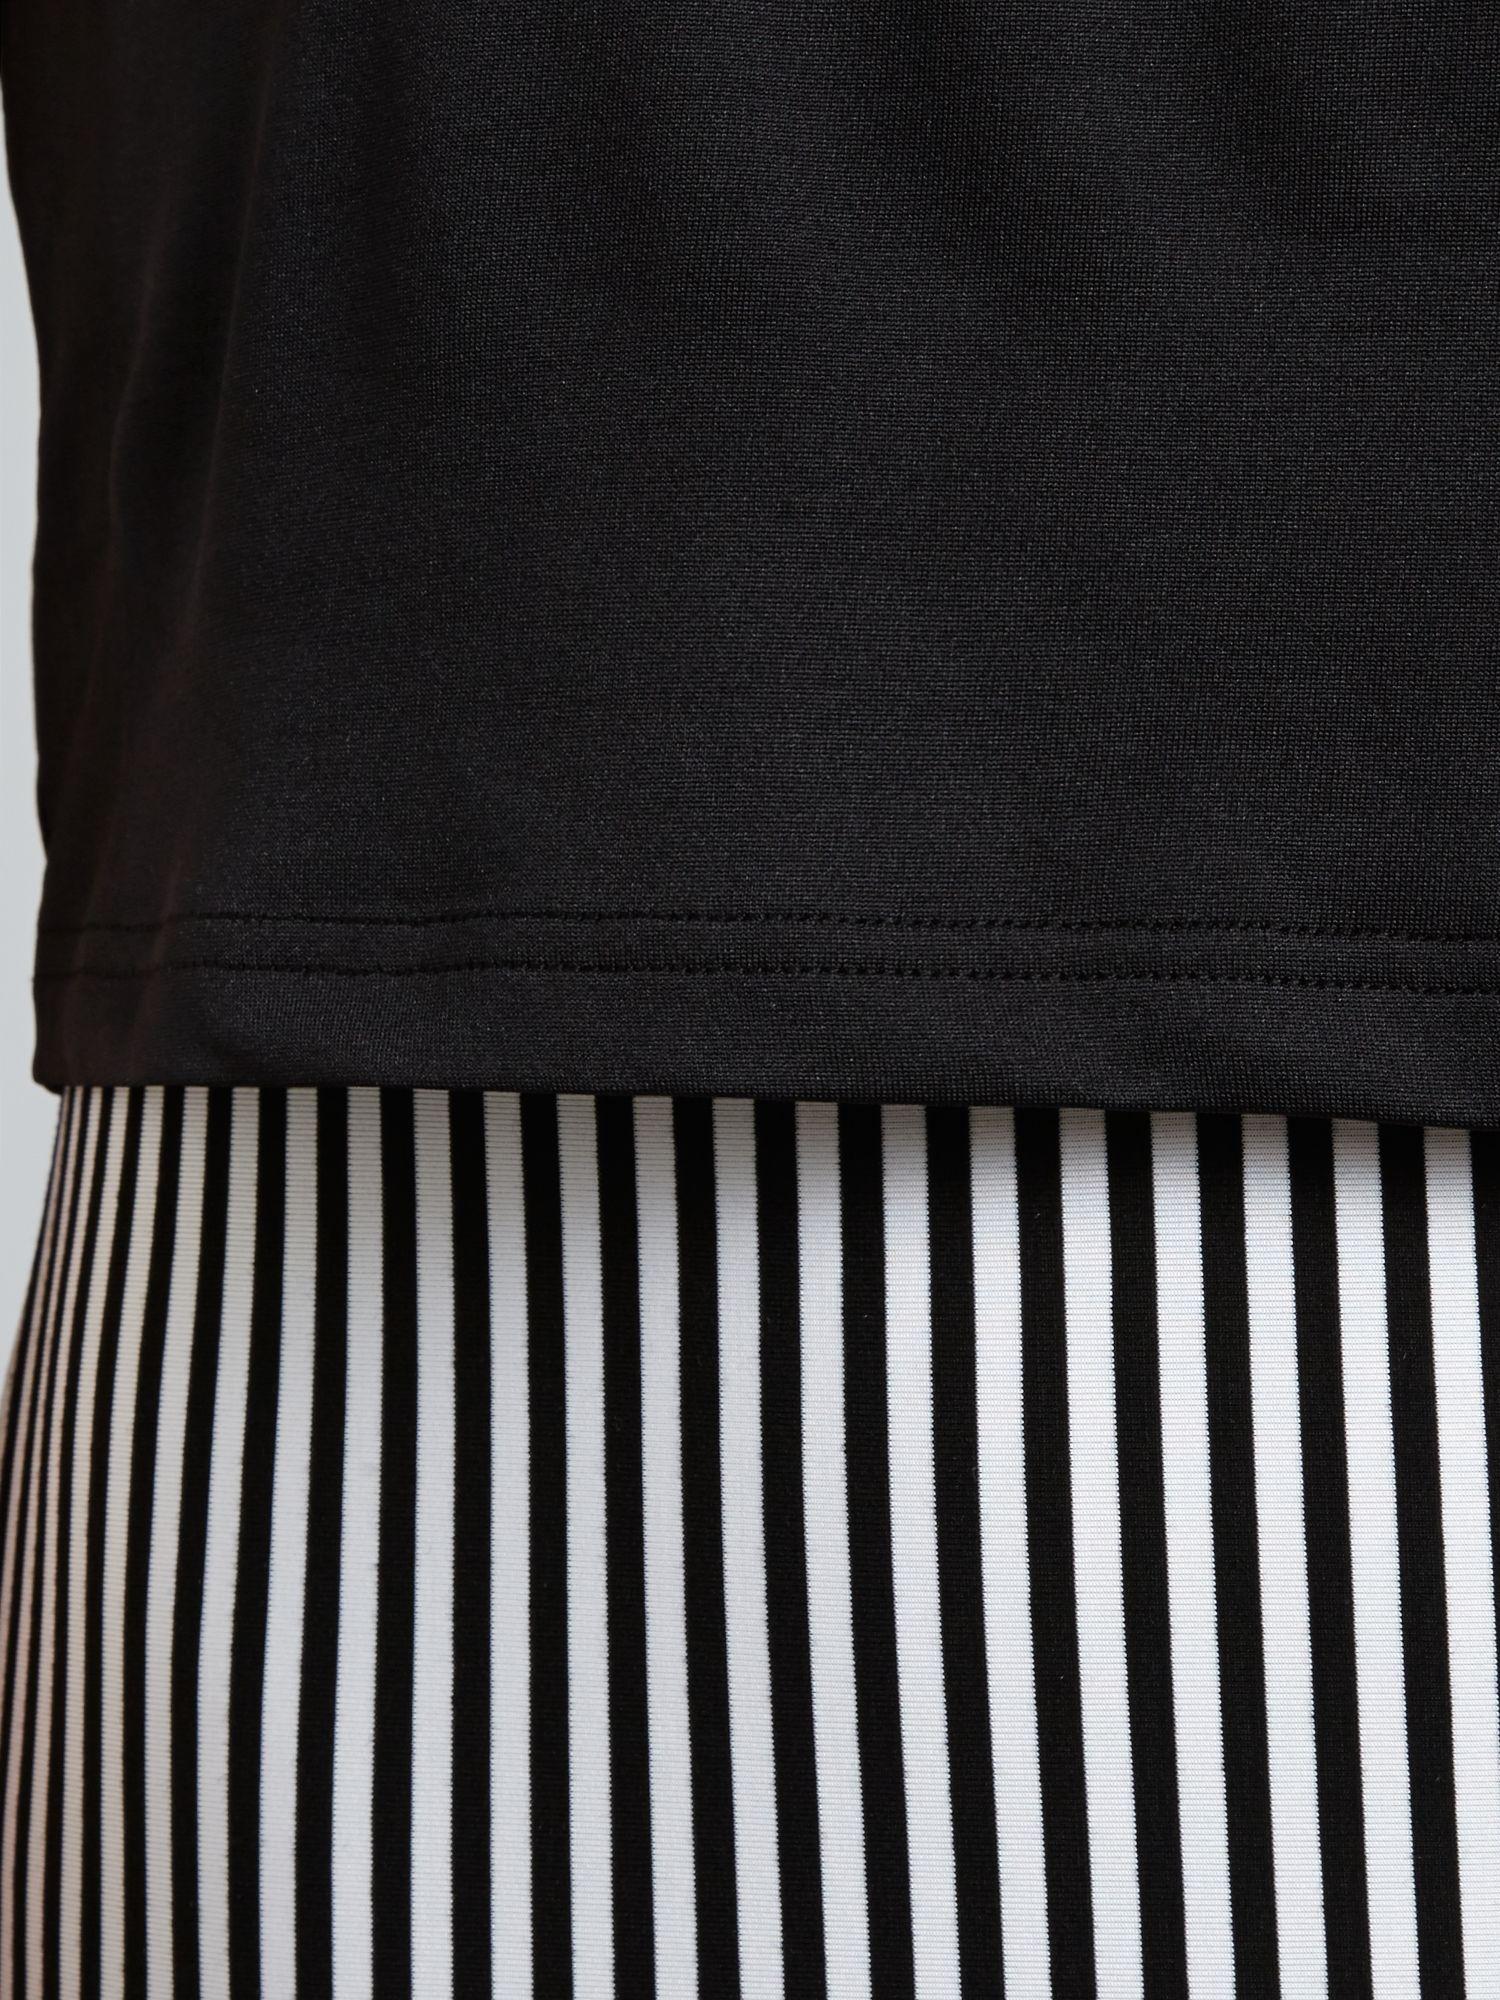 Pussycat Monochrome Stripe Layer Maxi Dress in Black & White (Black)